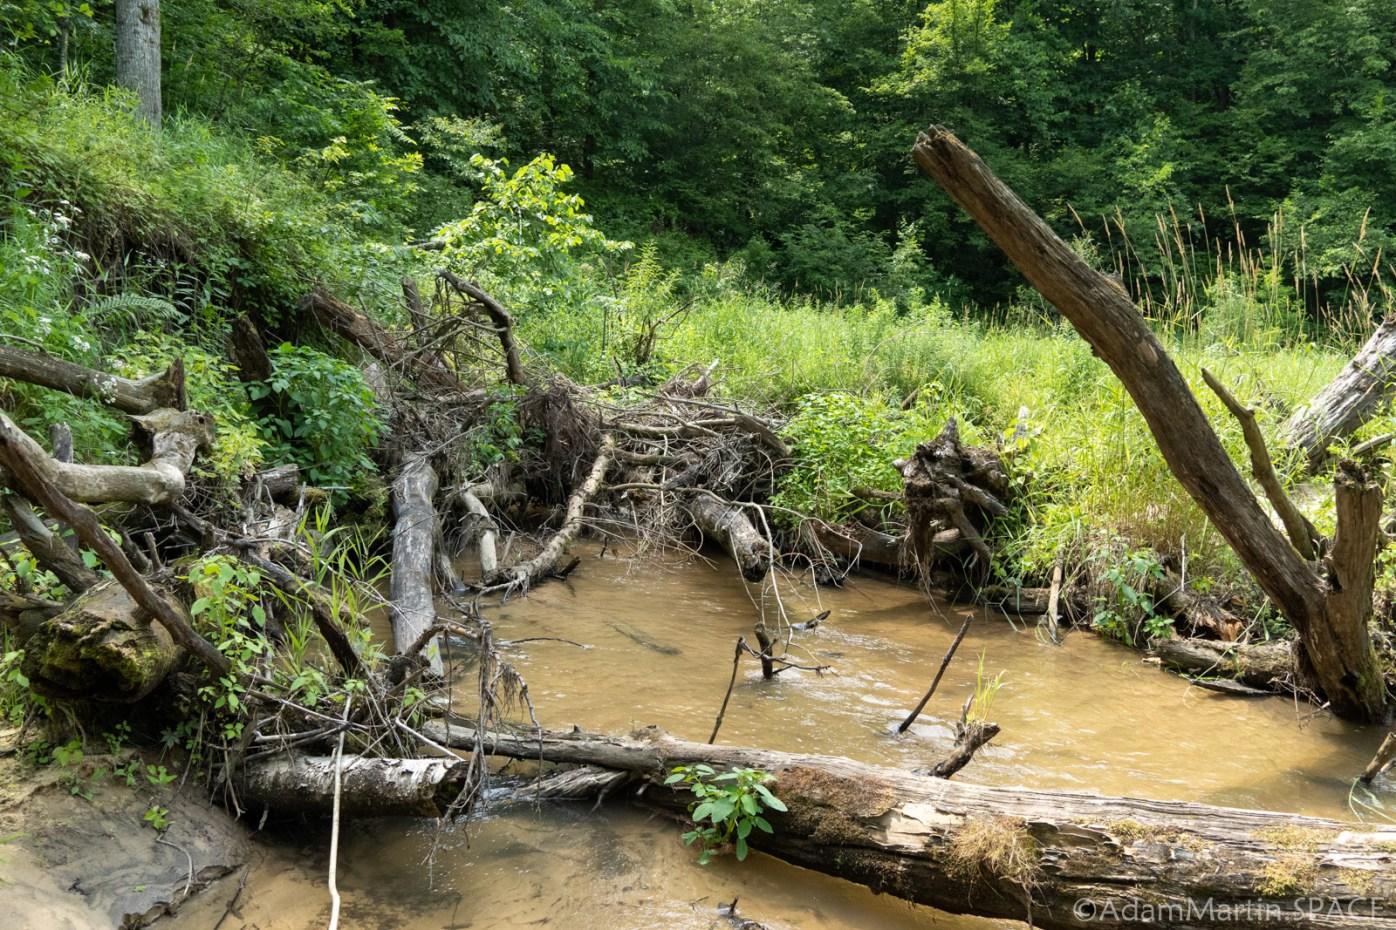 Deadfall blockage in Roaring Creek upstream from Lost Falls